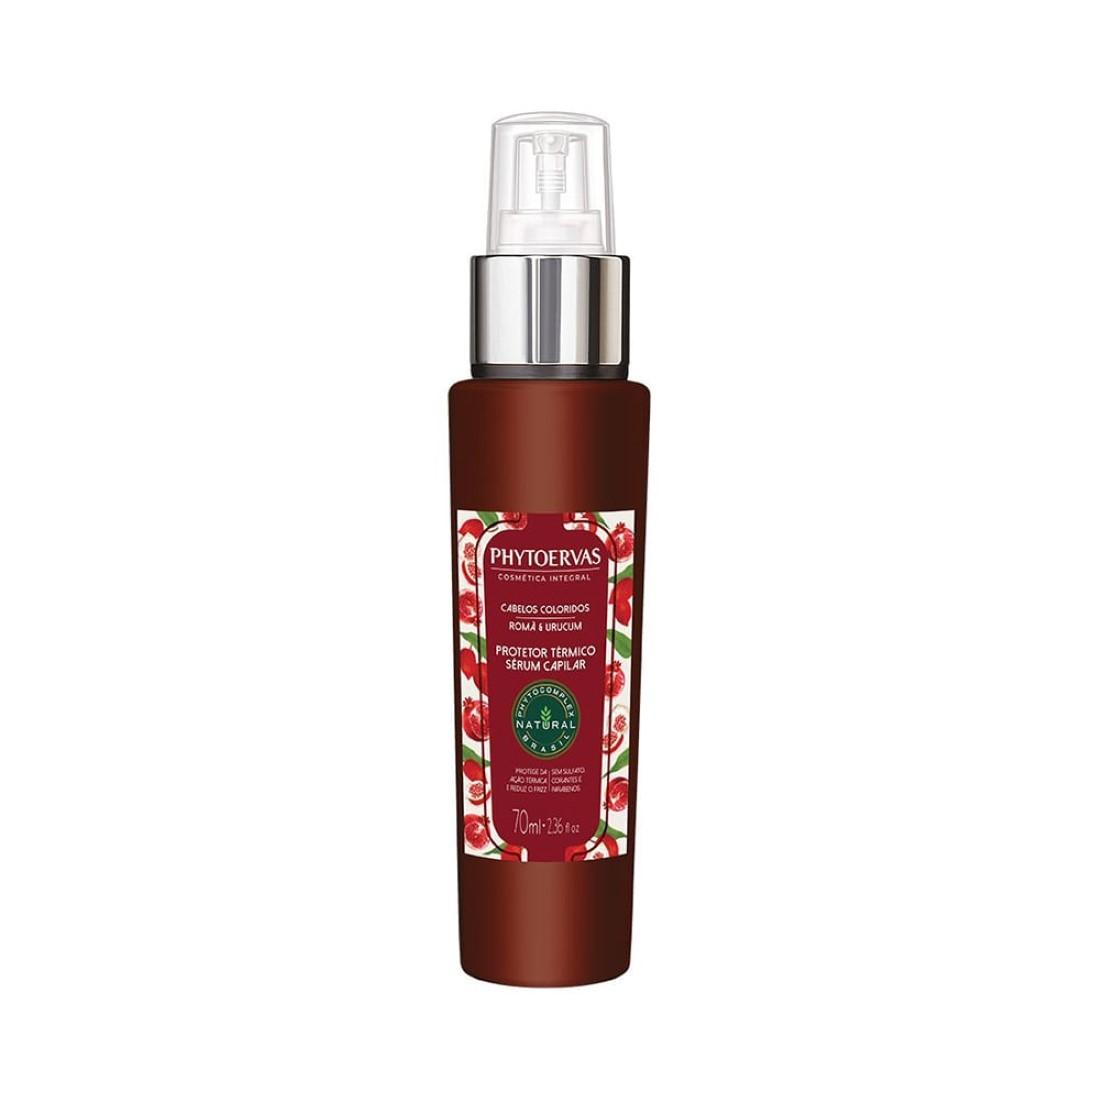 Protetor Térmico Cabelos Coloridos Romã e Urucum 70ml - Phytoervas